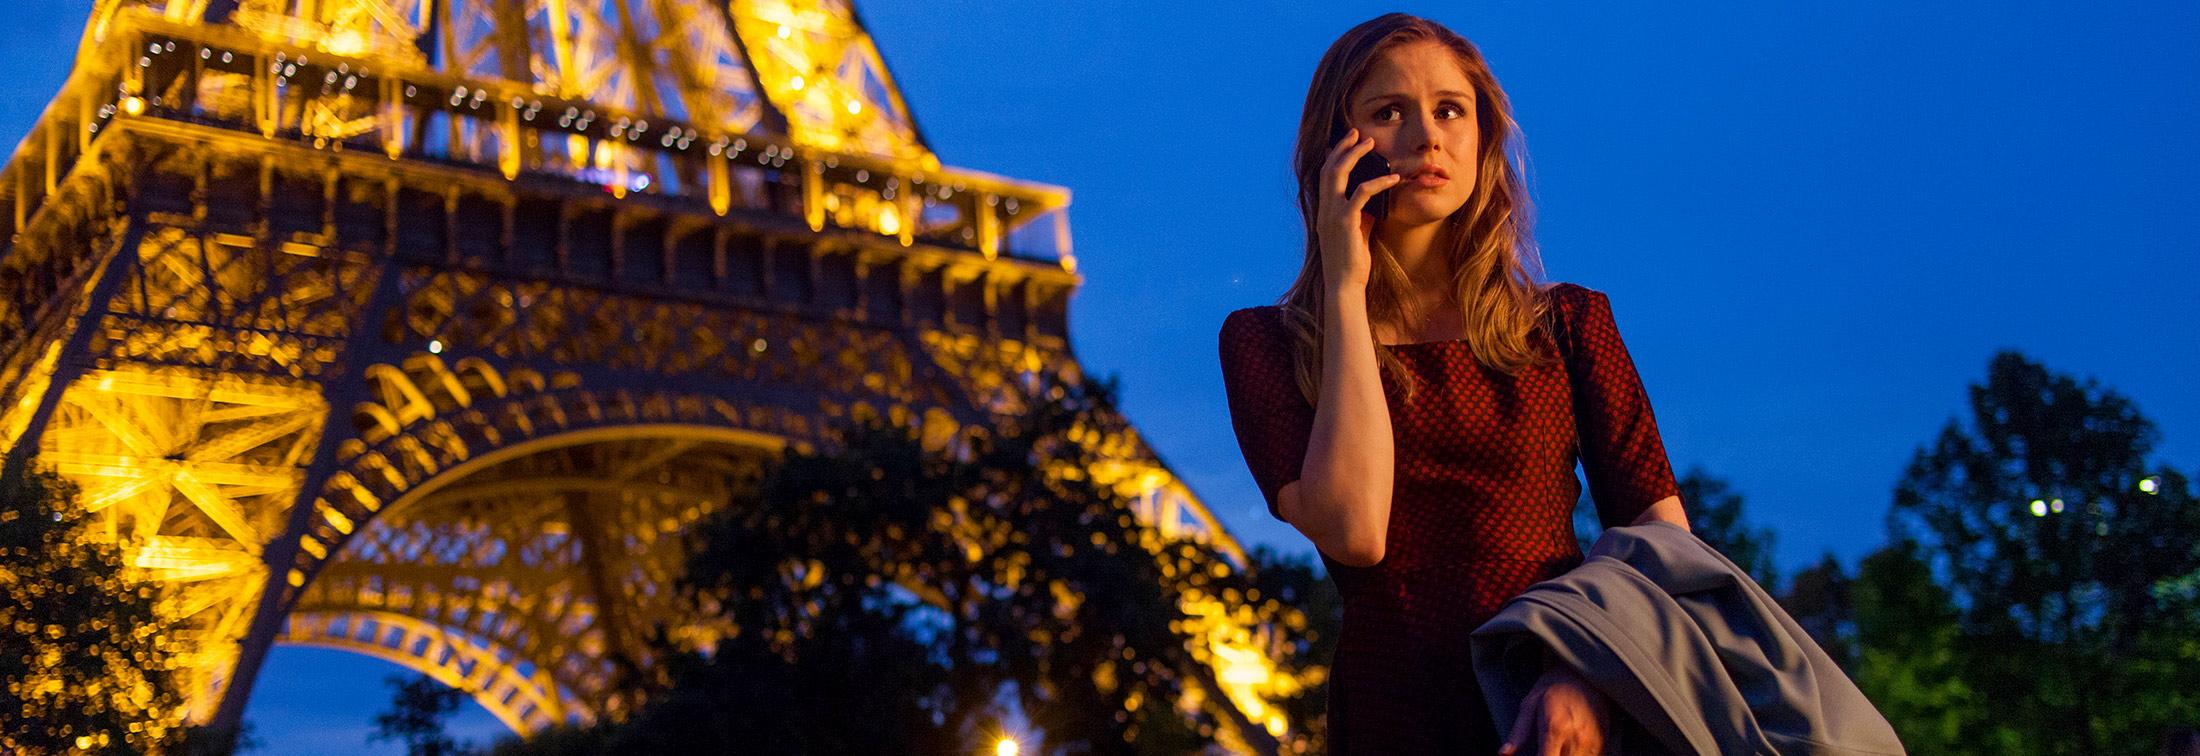 Alliance Française French Film Festival 2019 - The reviews